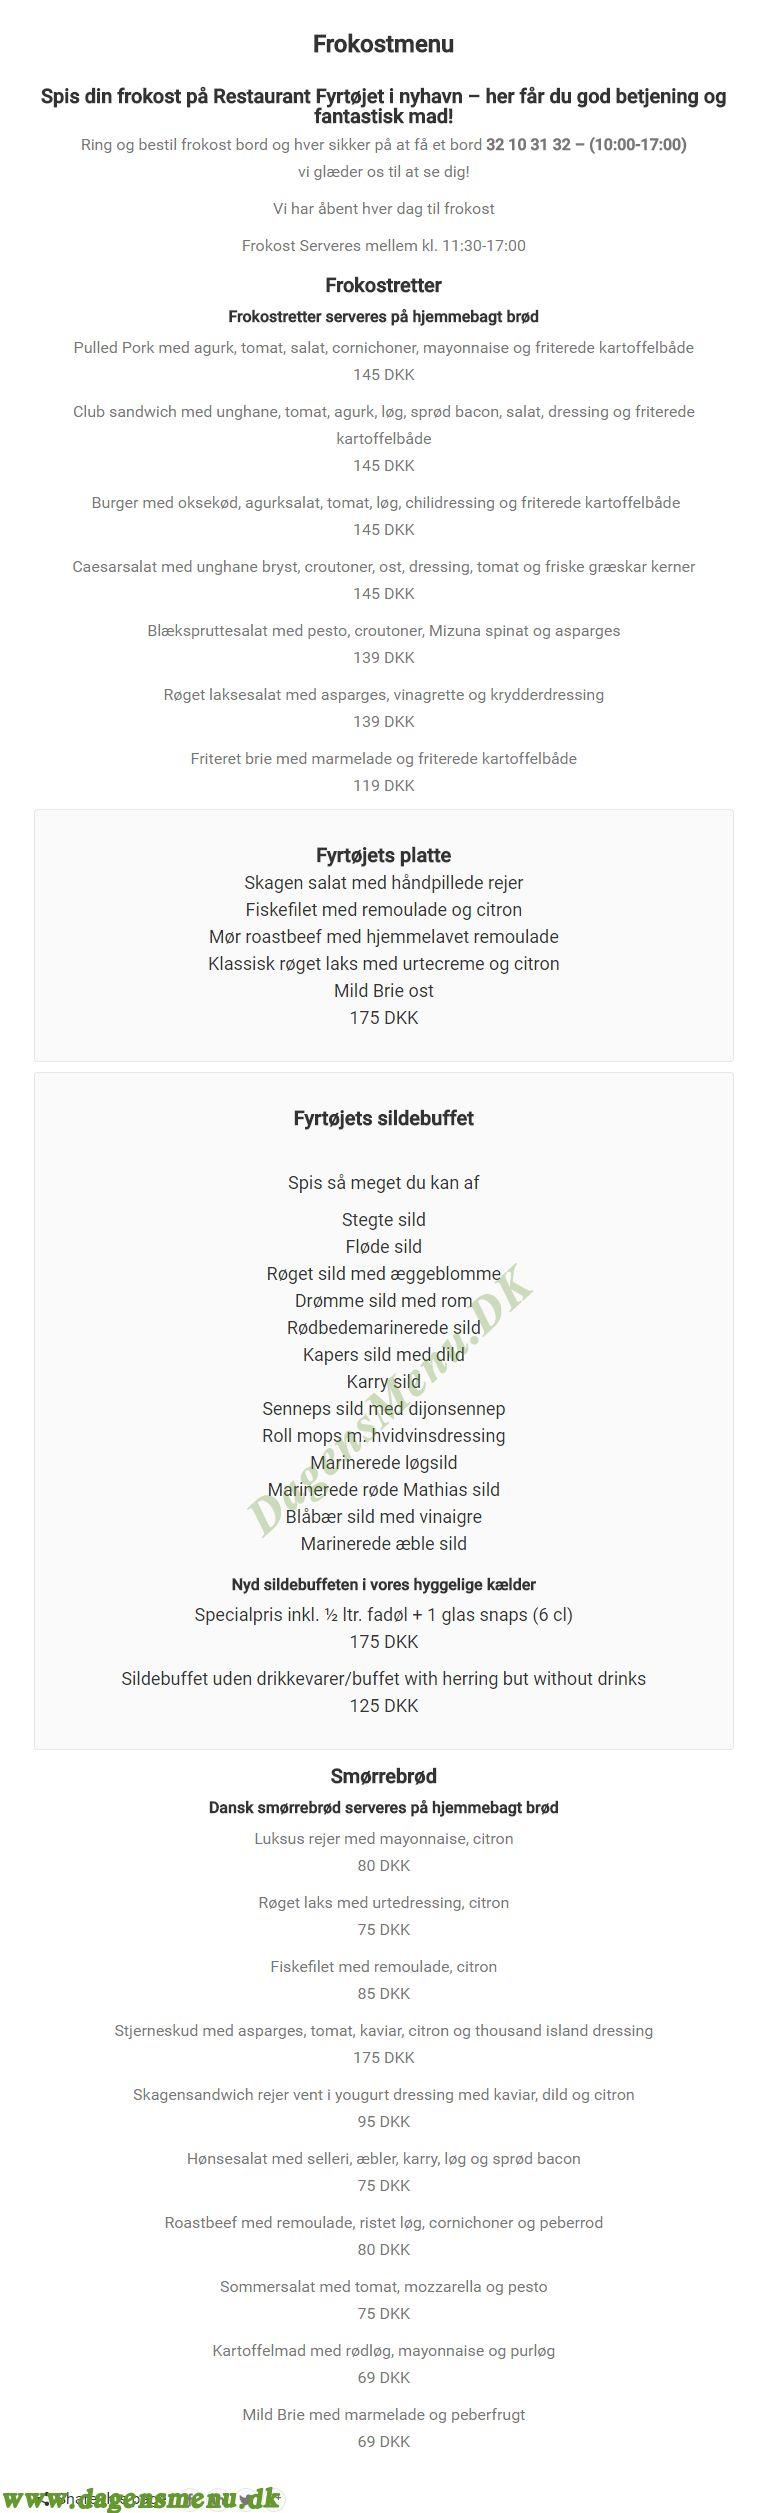 Restaurant Fyrtøjet - Menukort